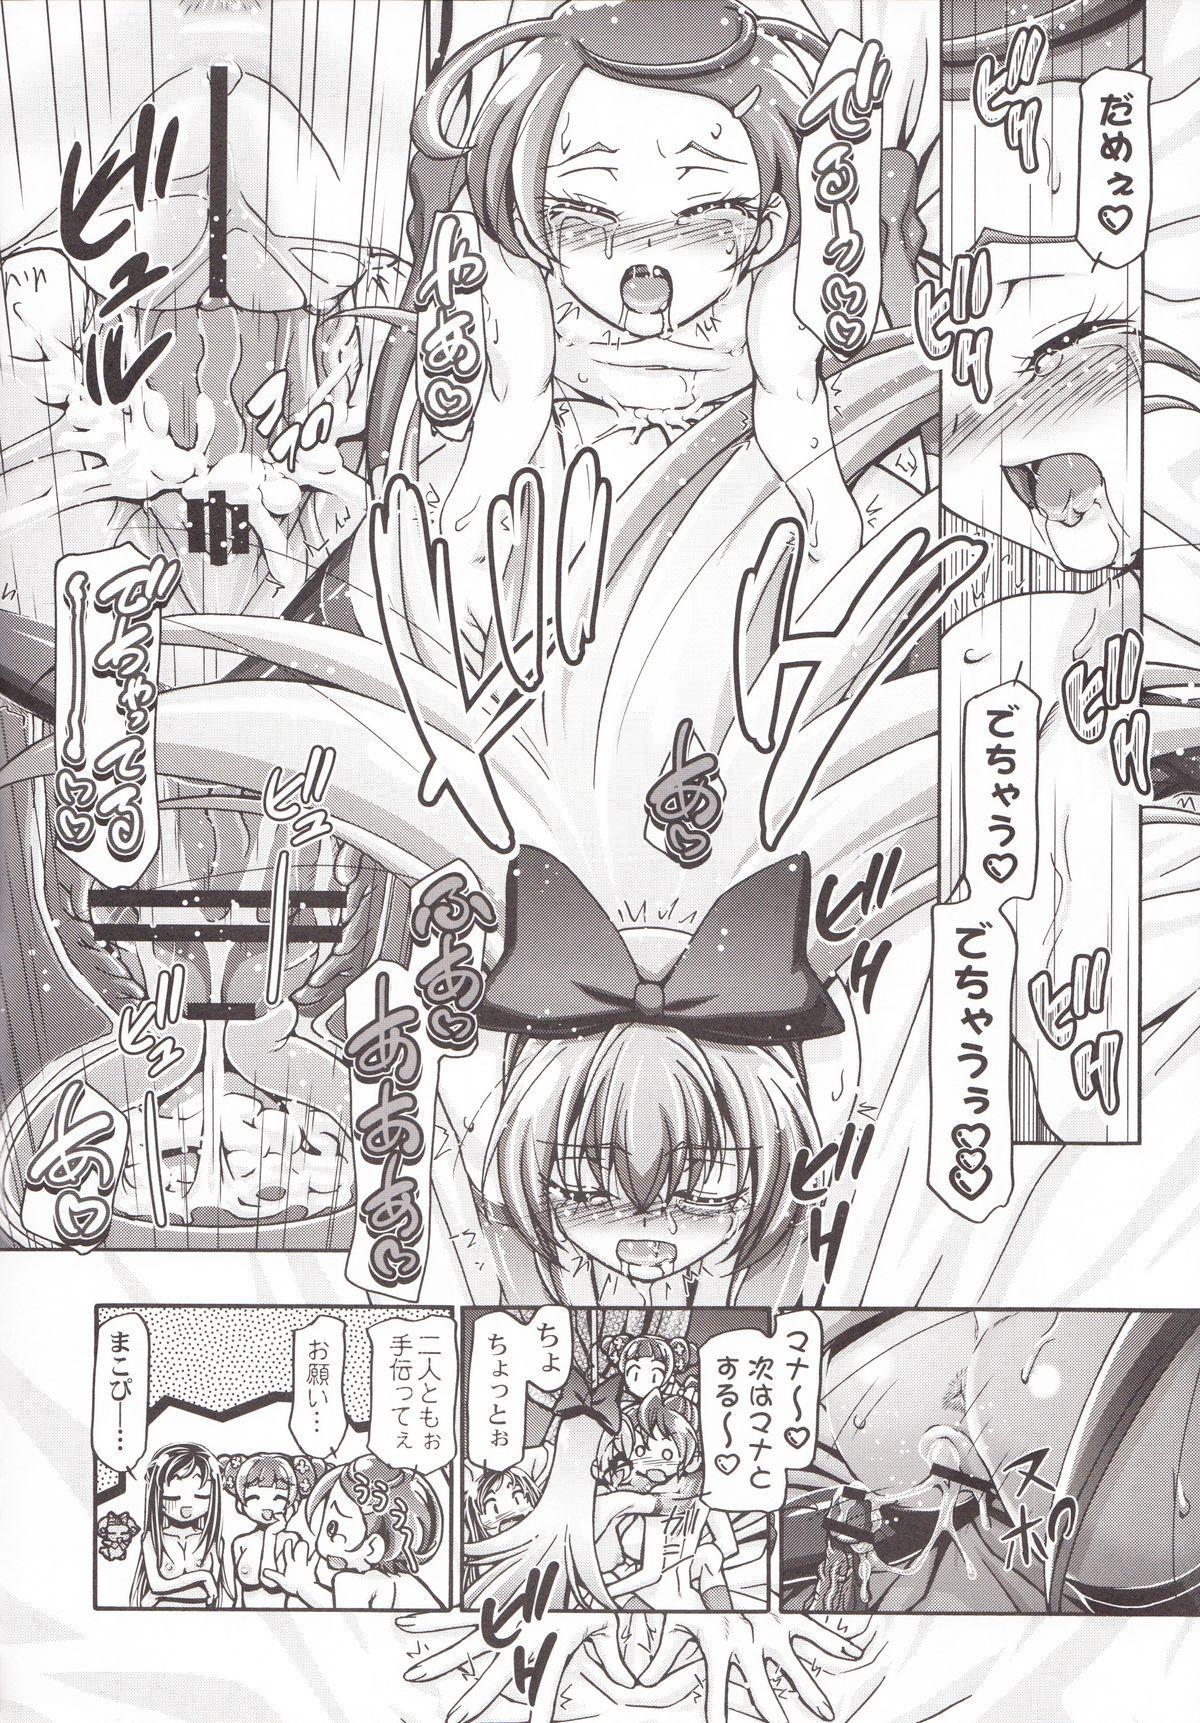 DokiDoki Punicure 2 22